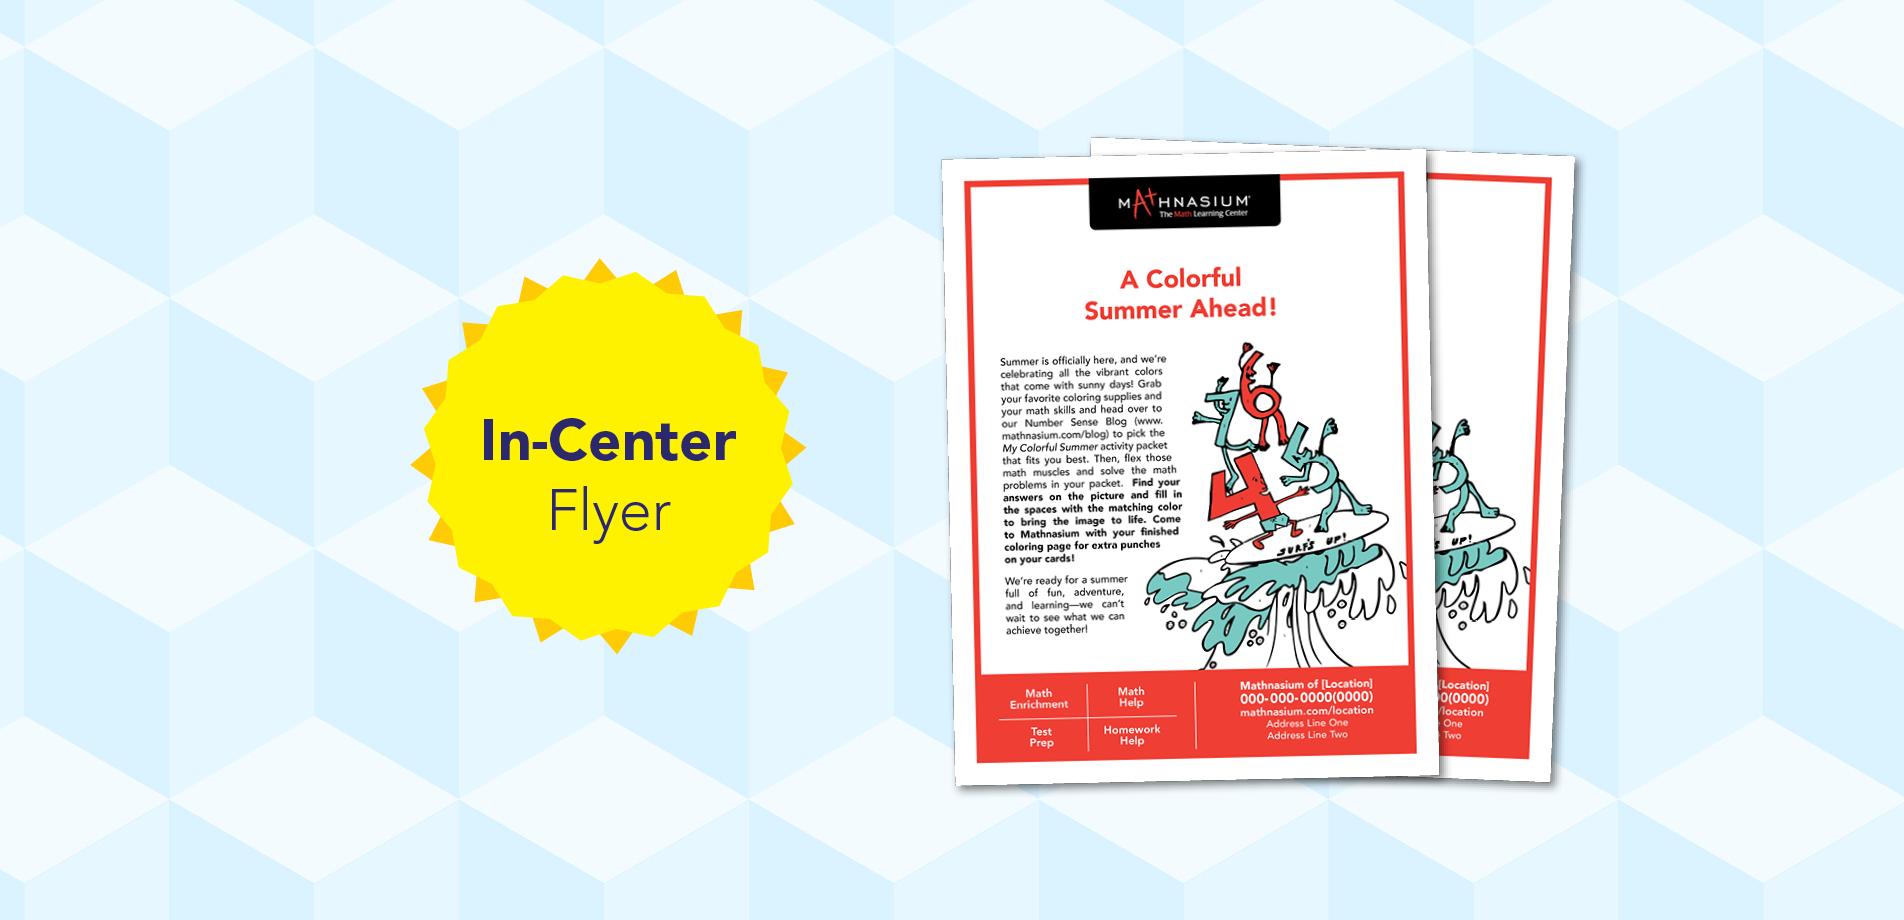 Sample-Email-In-Center-Flyer-June-2016